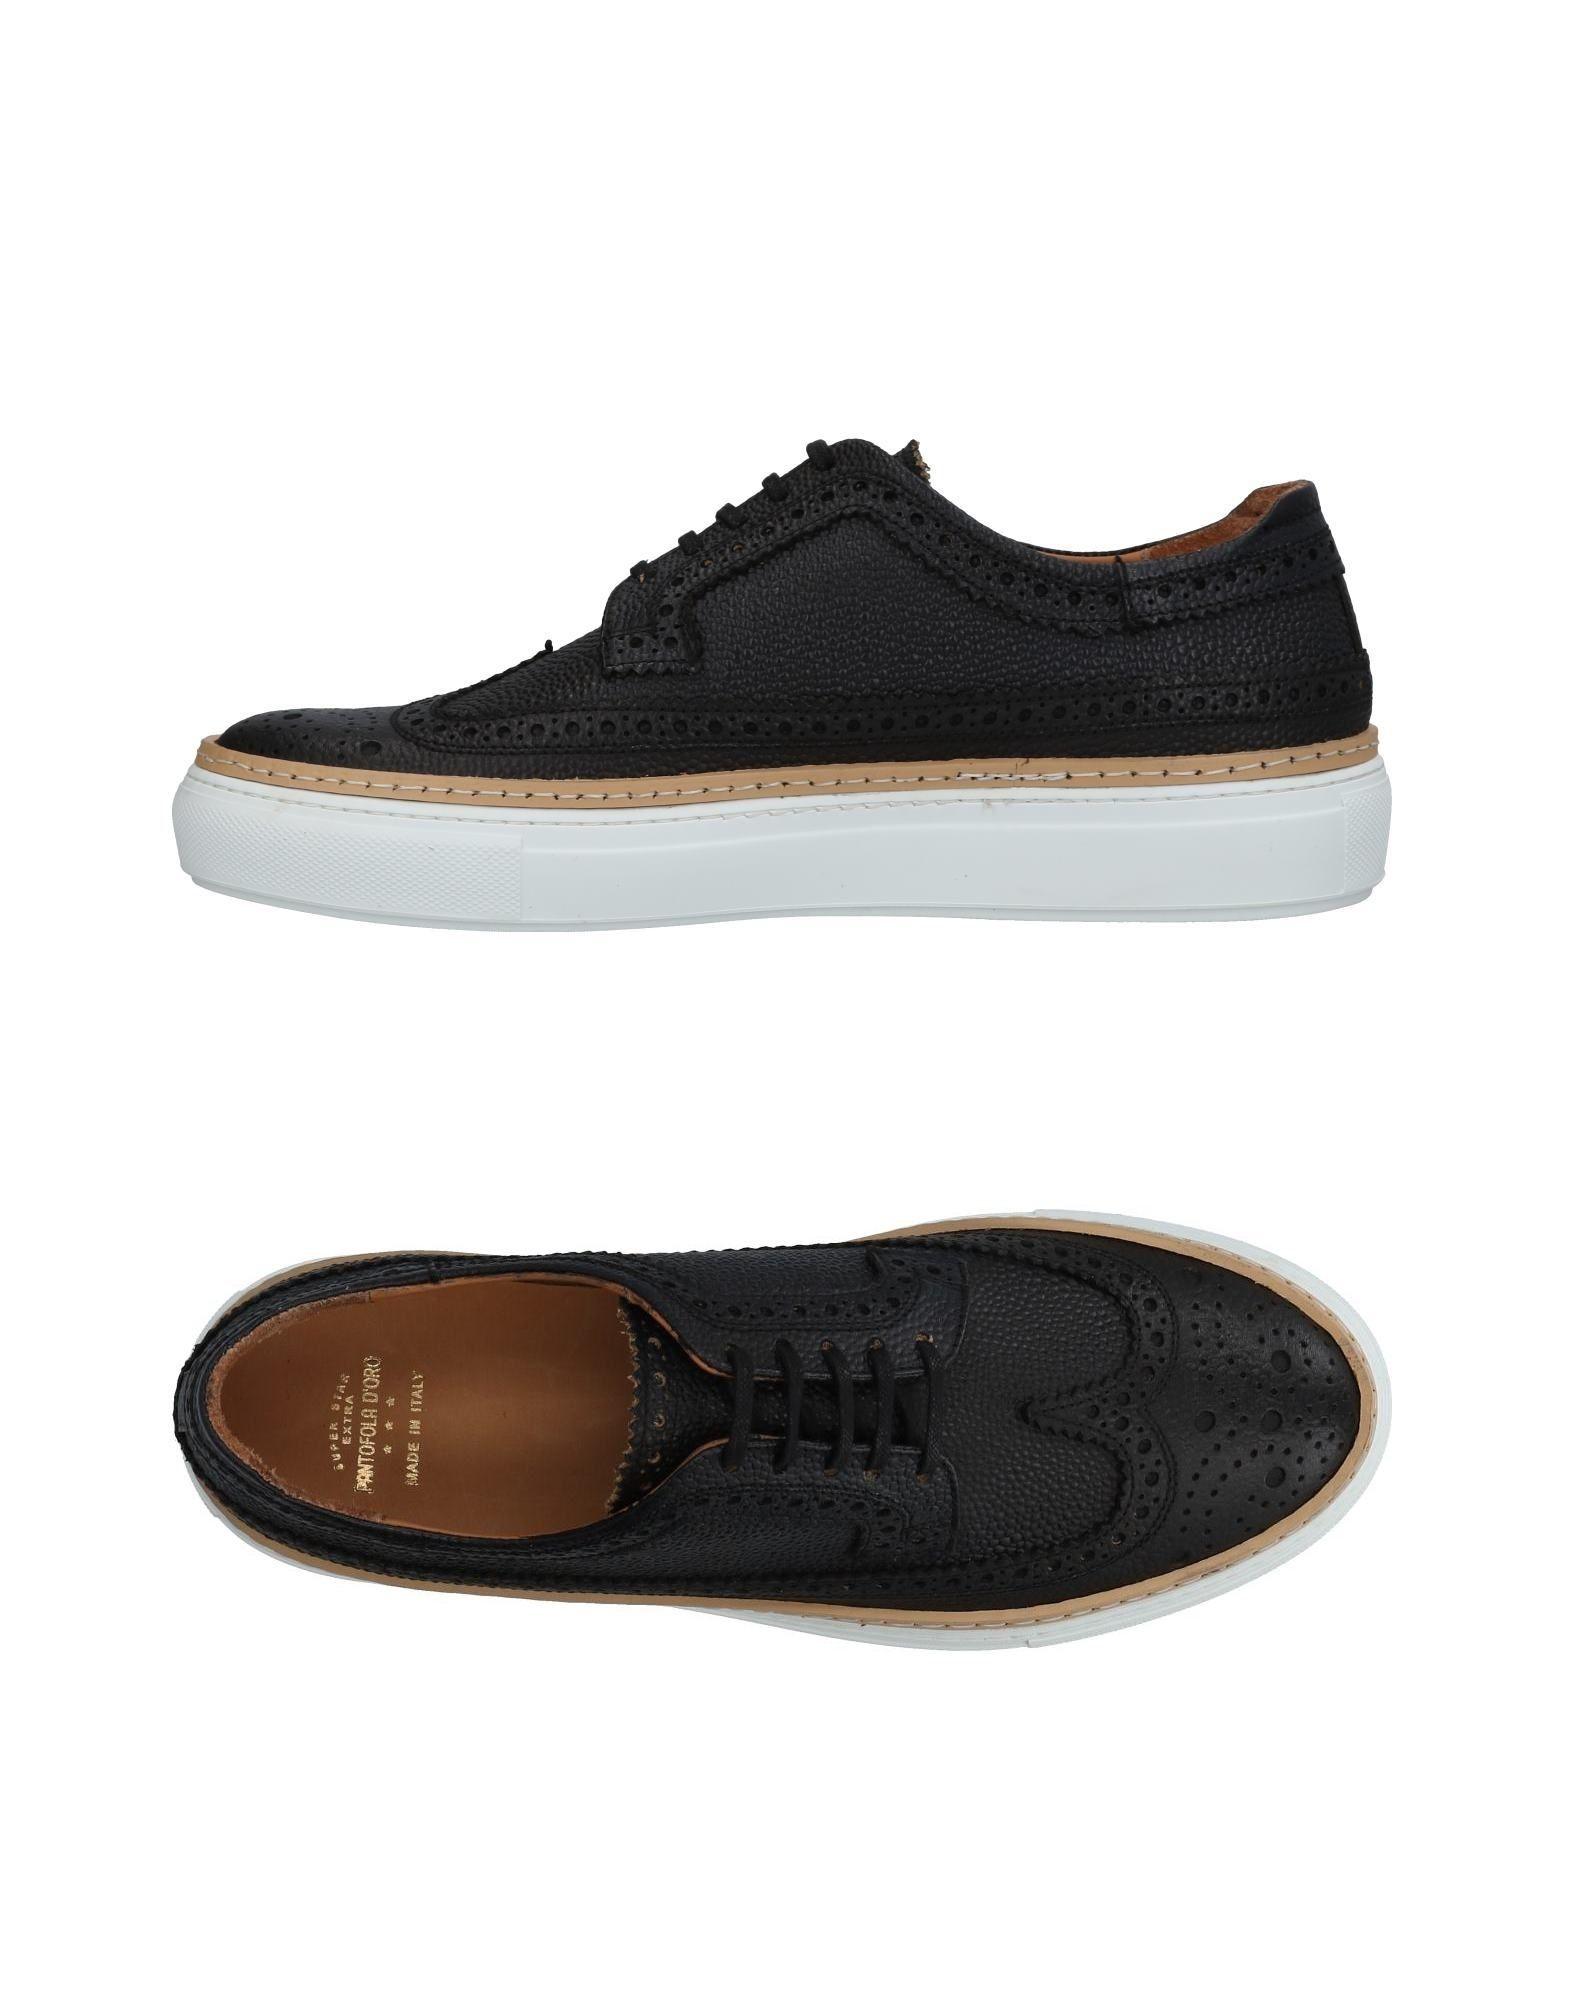 Stringate Pantofola Doro Uomo - Acquista online su